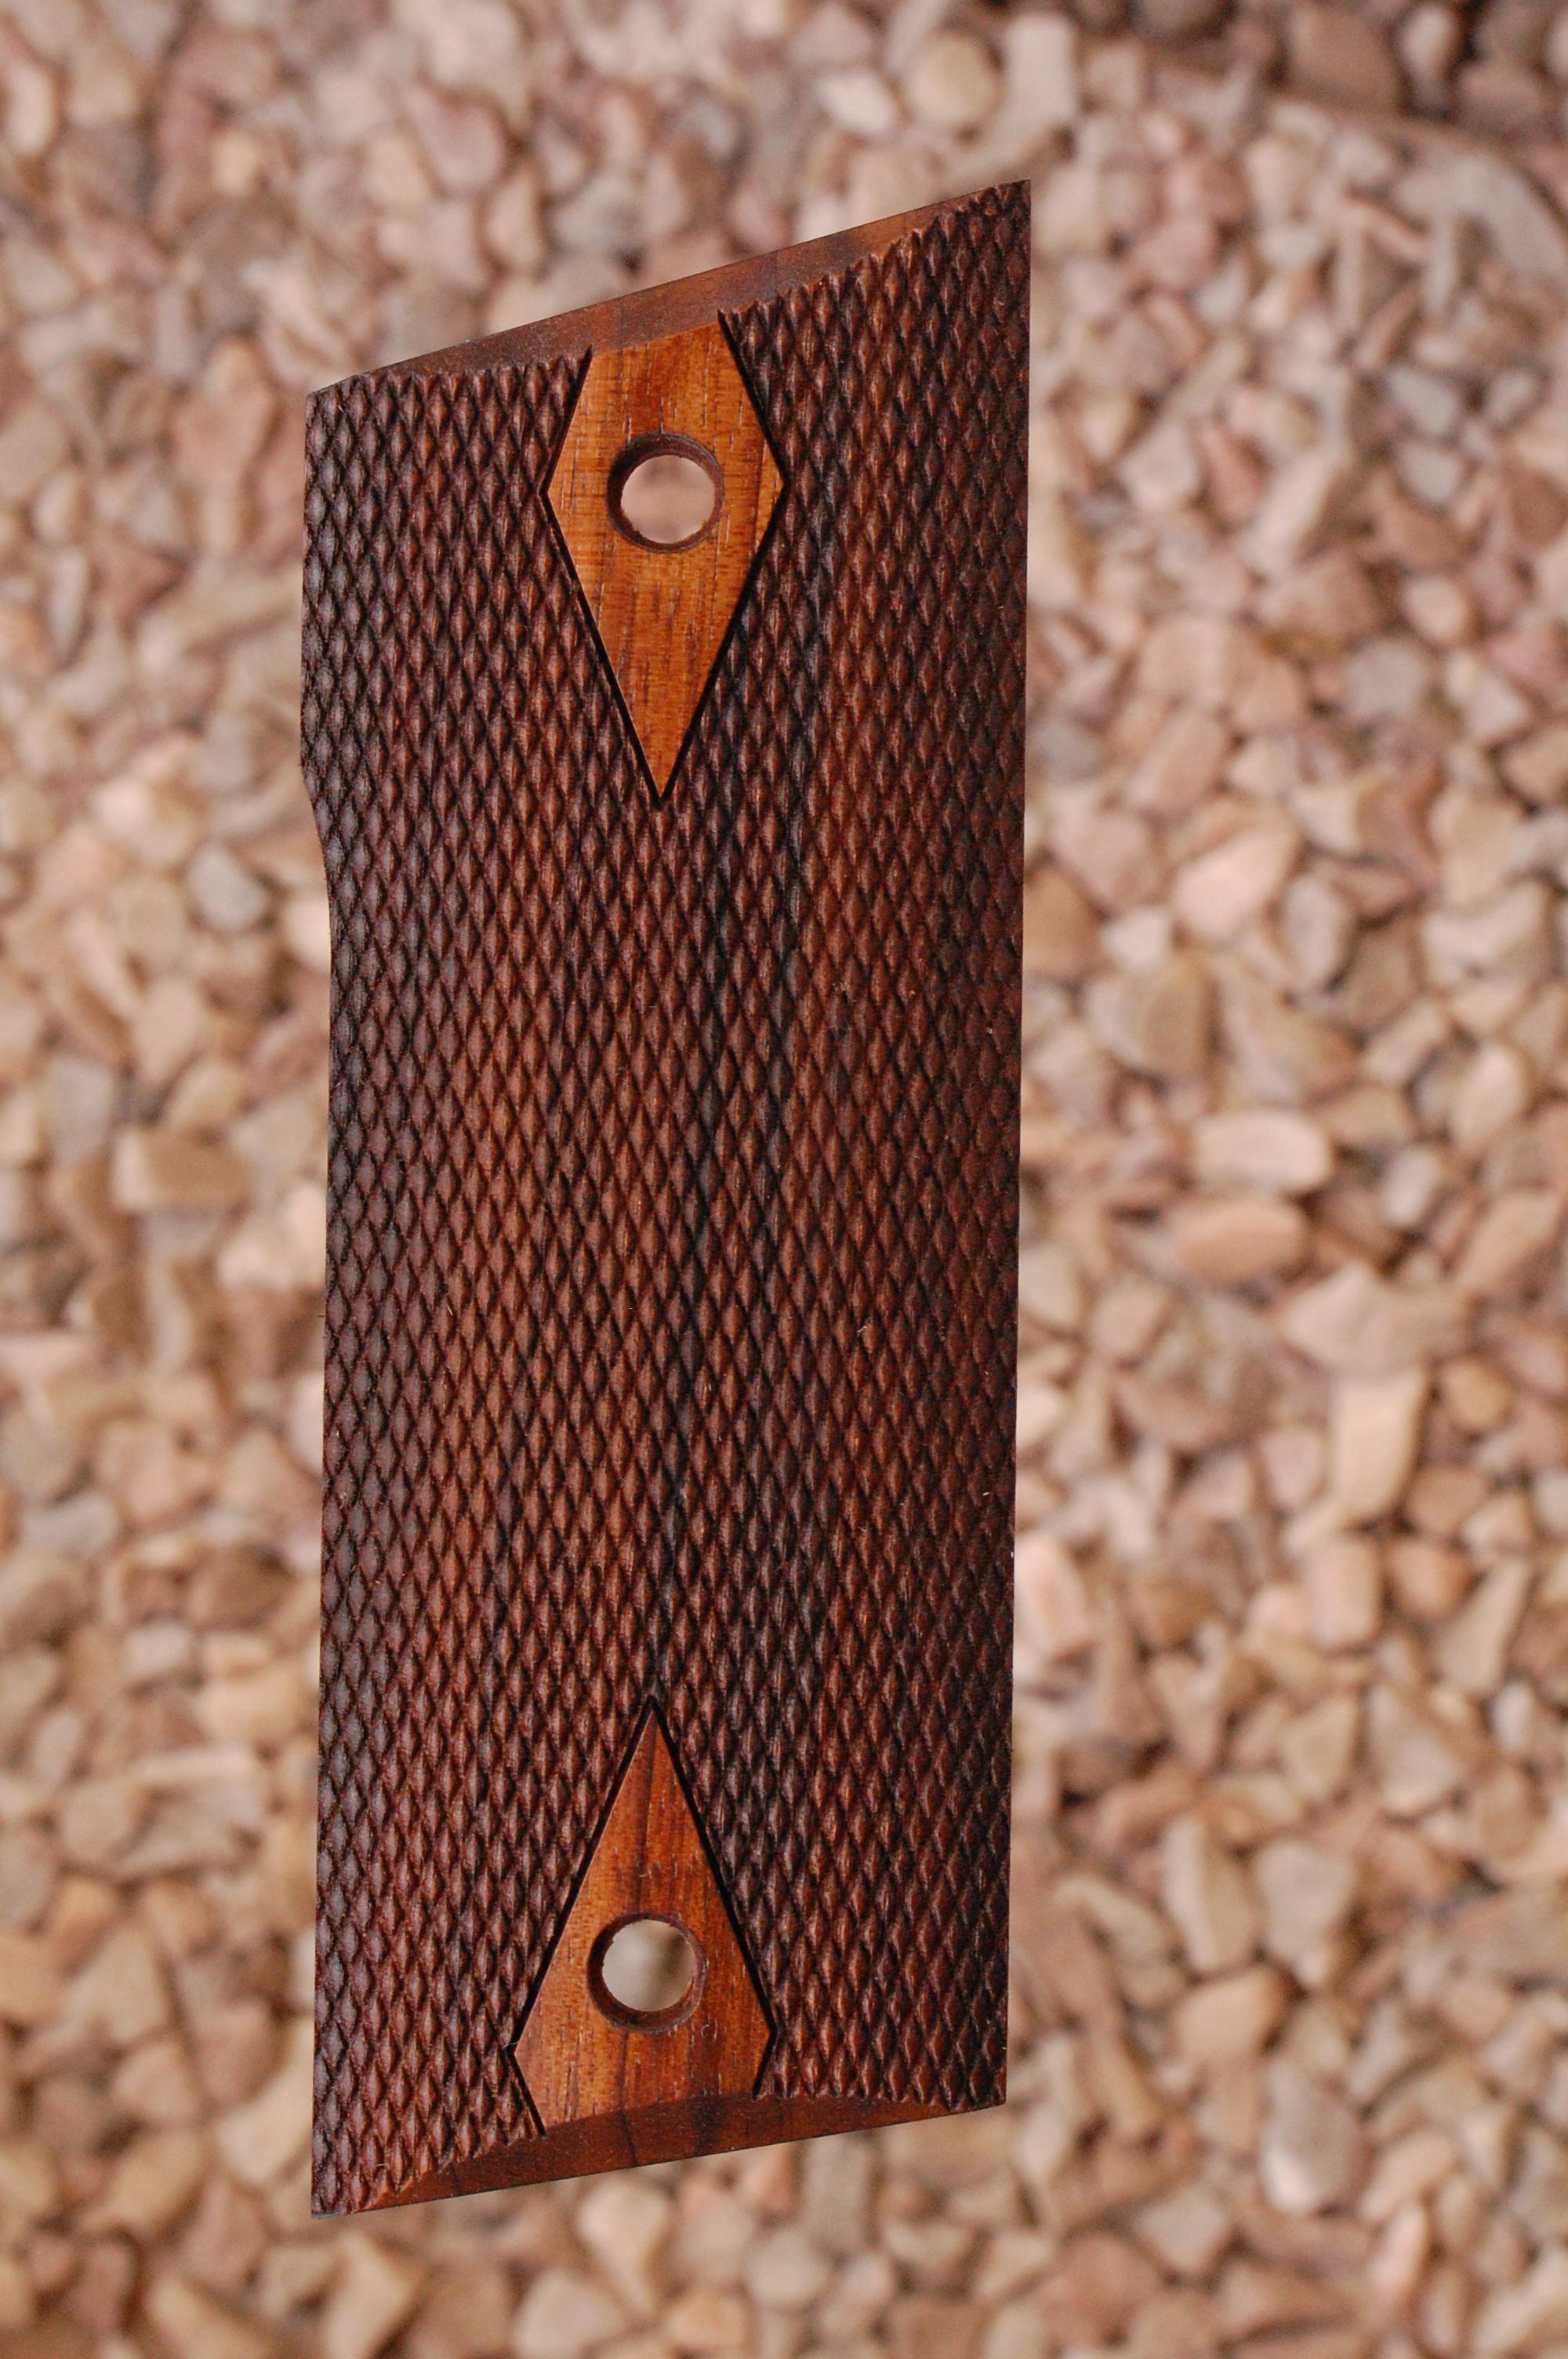 COONAN B grips (checkered) - full size